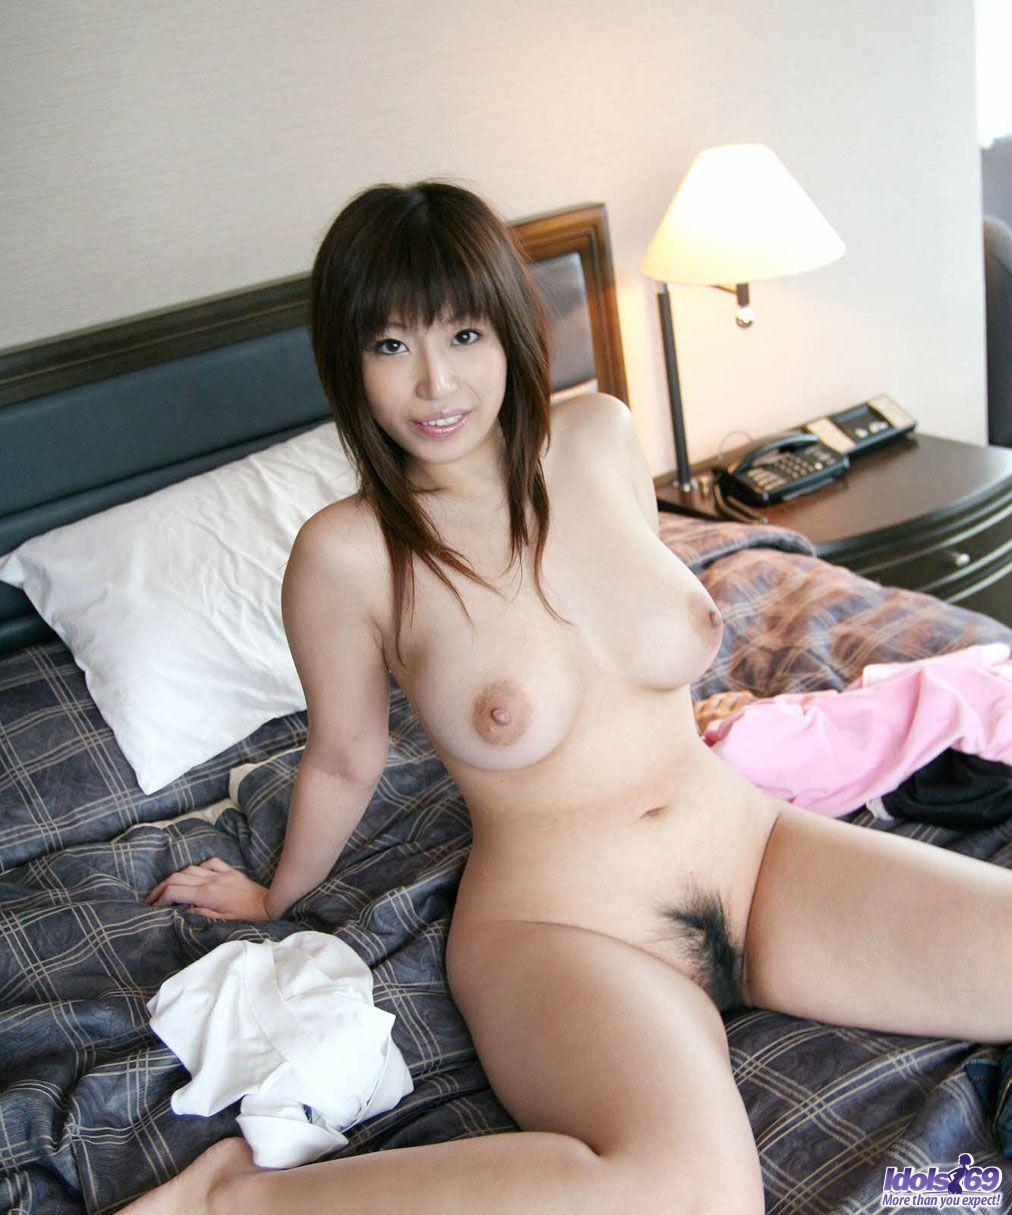 Japonesas Asiaticas Conchas Peludas Afeitadas